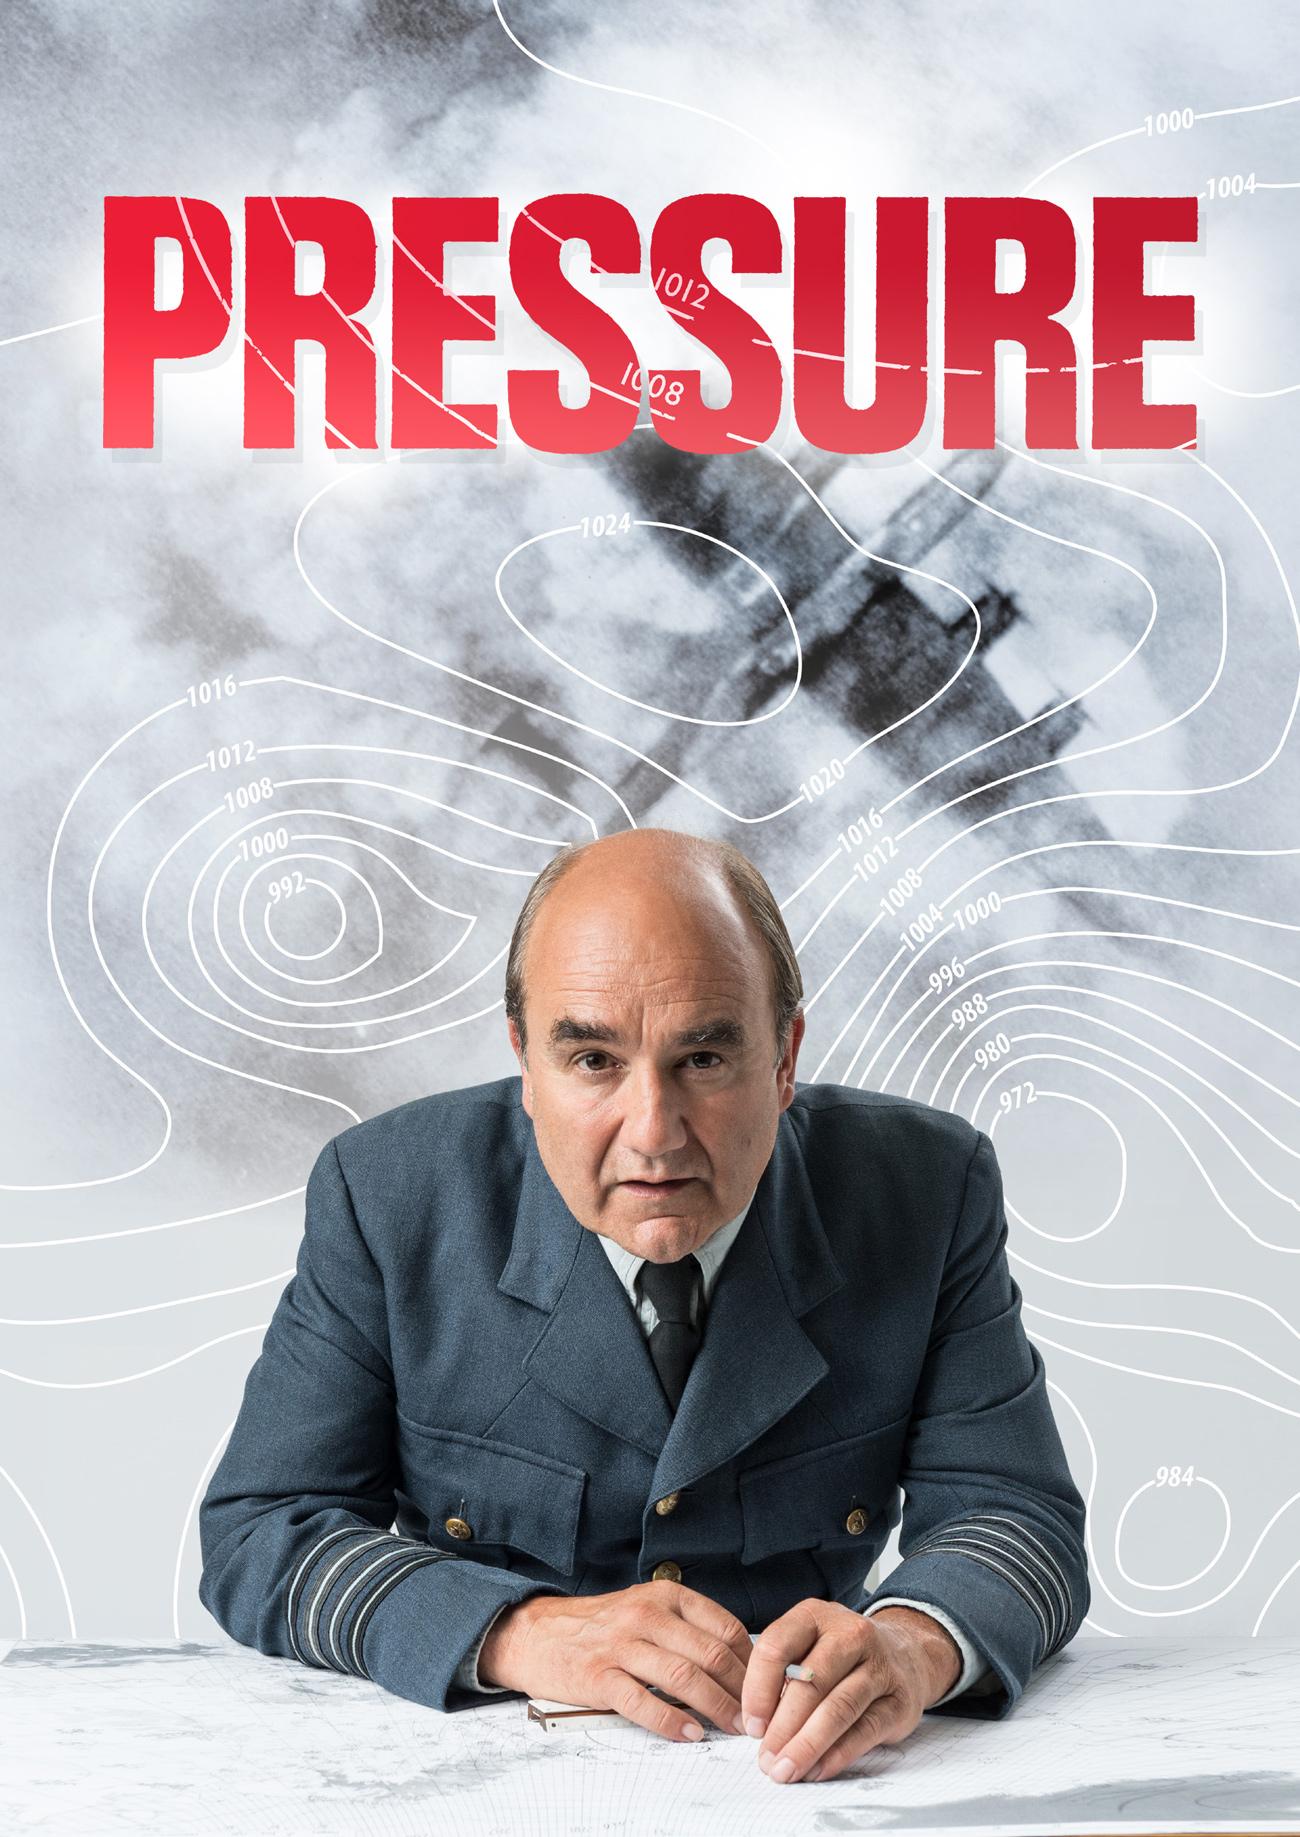 Pressure - Poster Image.jpg